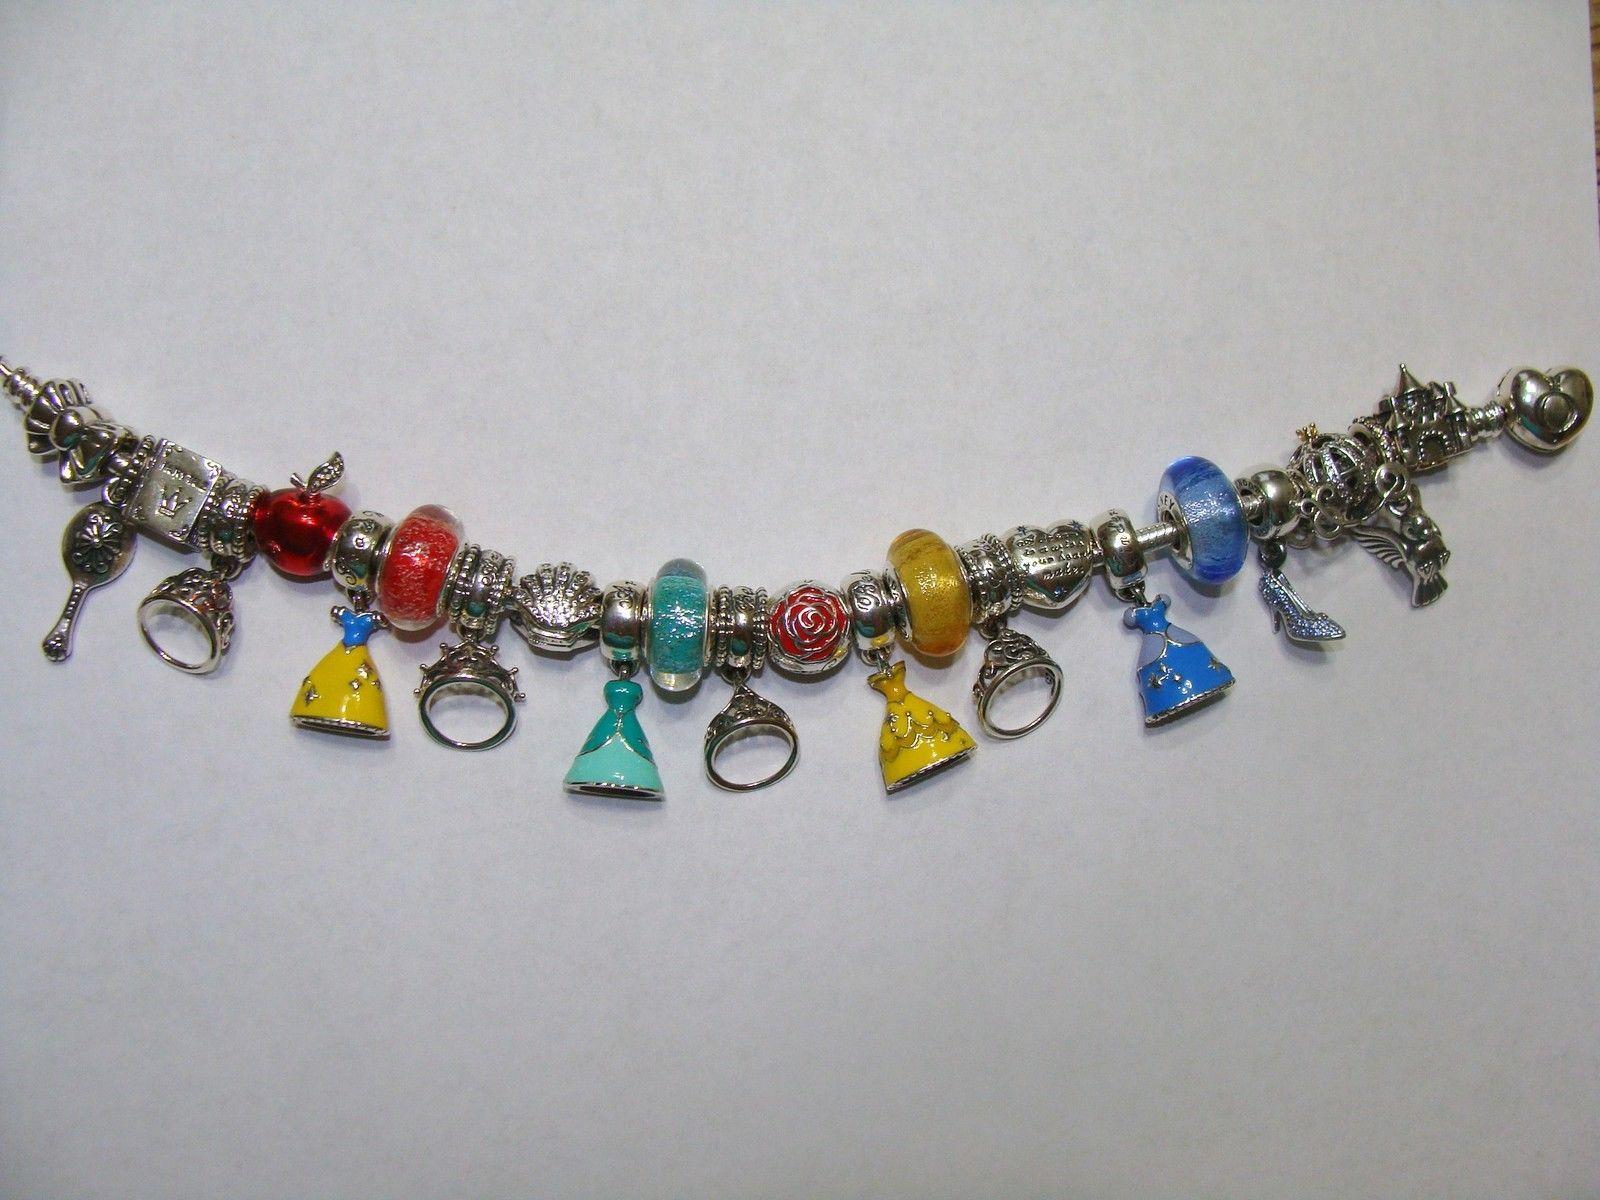 Pandora Disney Princess 23 Charms With Heart Clasp Bracelet 7.5/19 ...